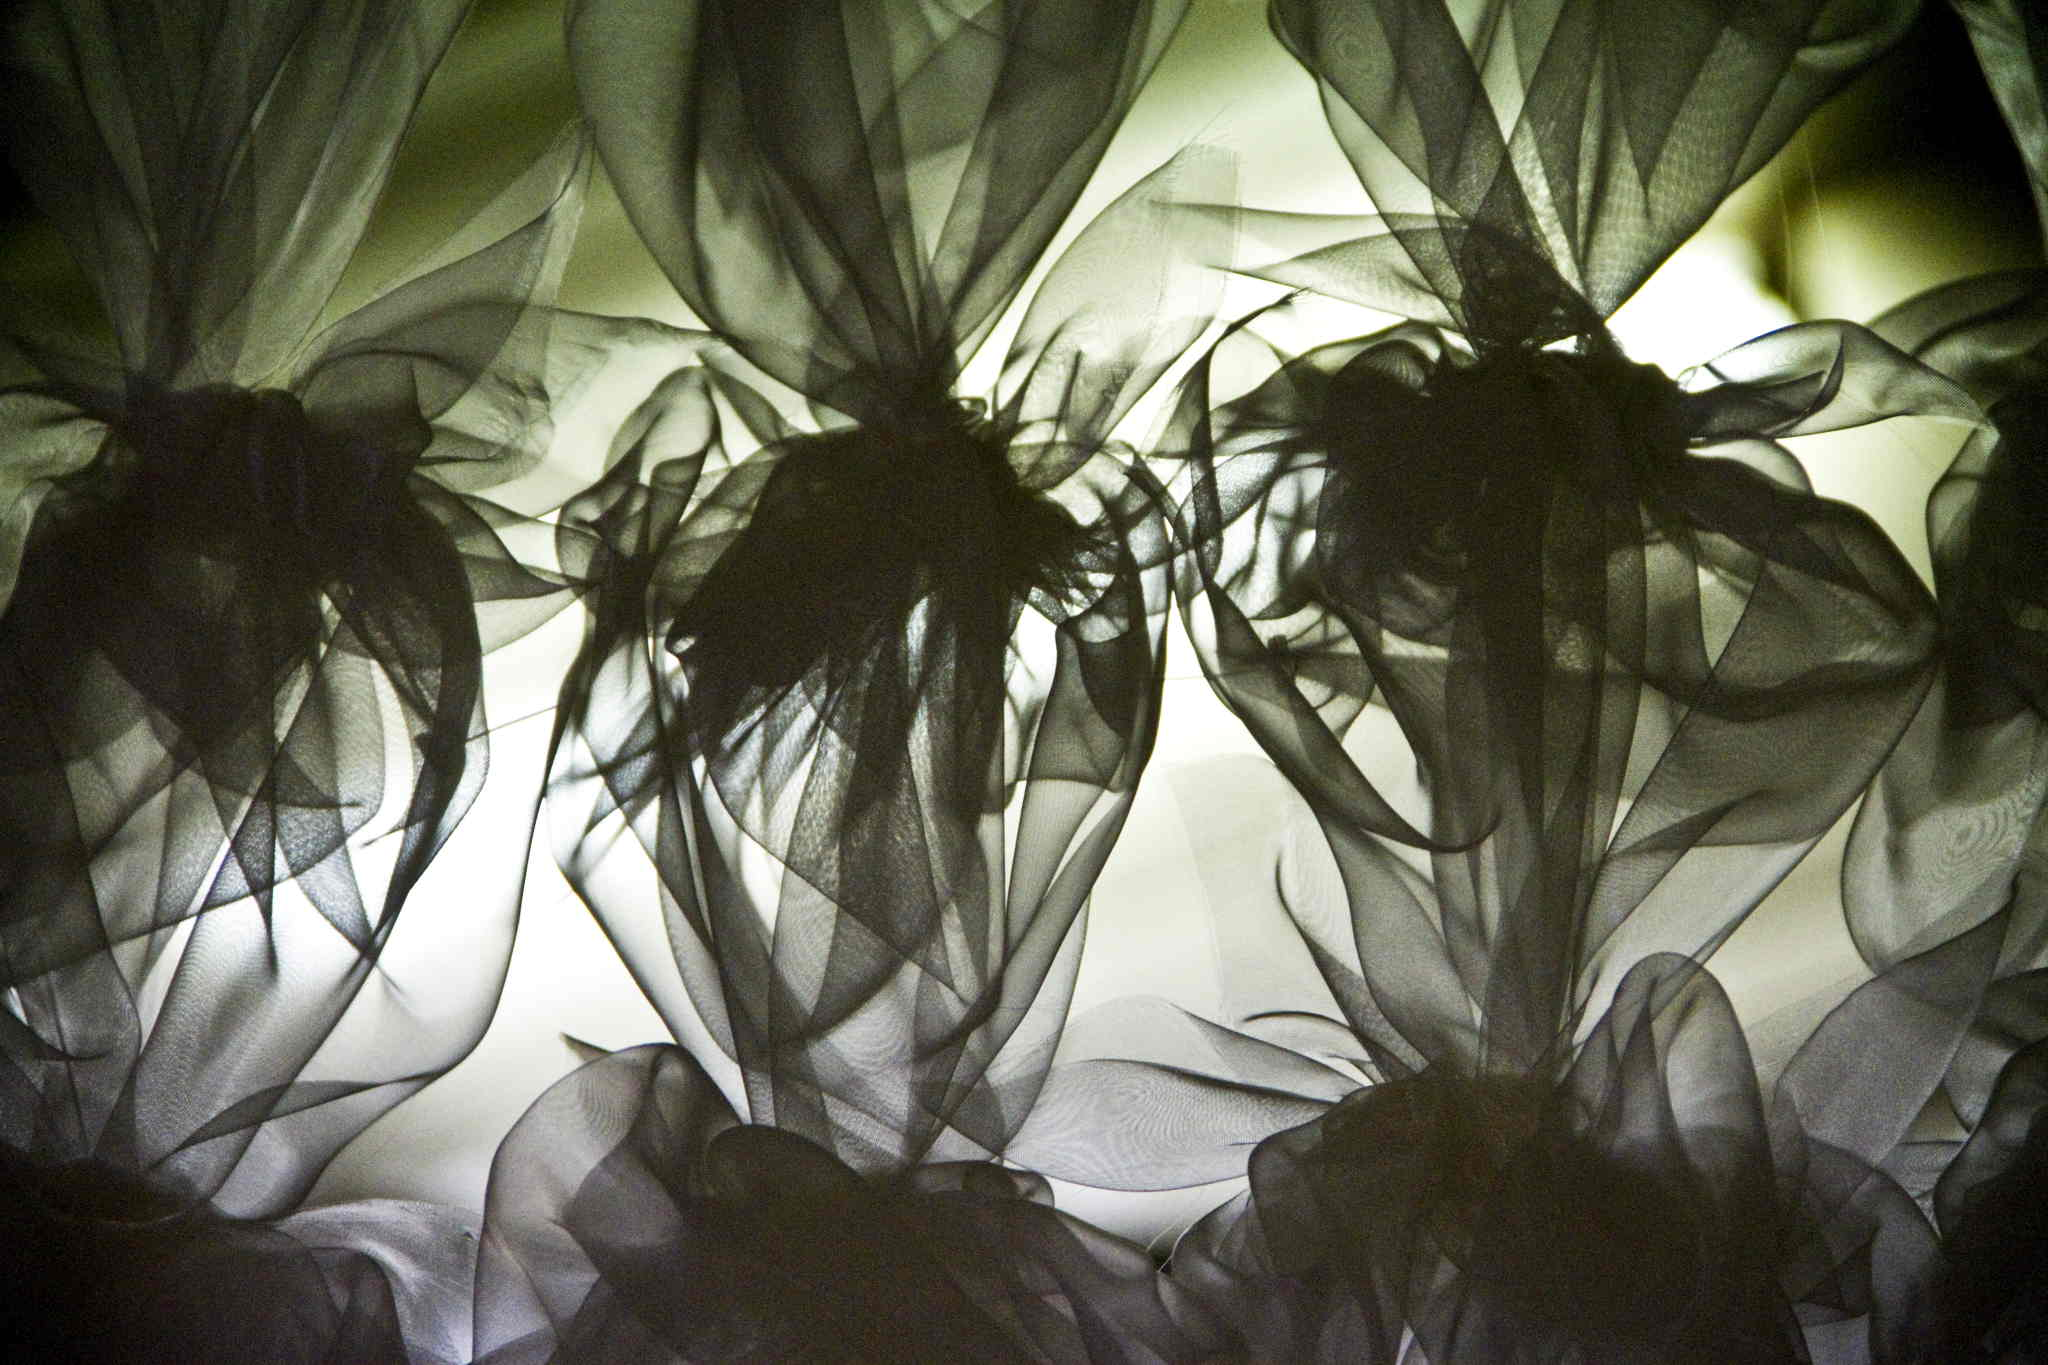 Illuminated By Fire, Briagolong 2010.  Artist: Maxine Salvatore